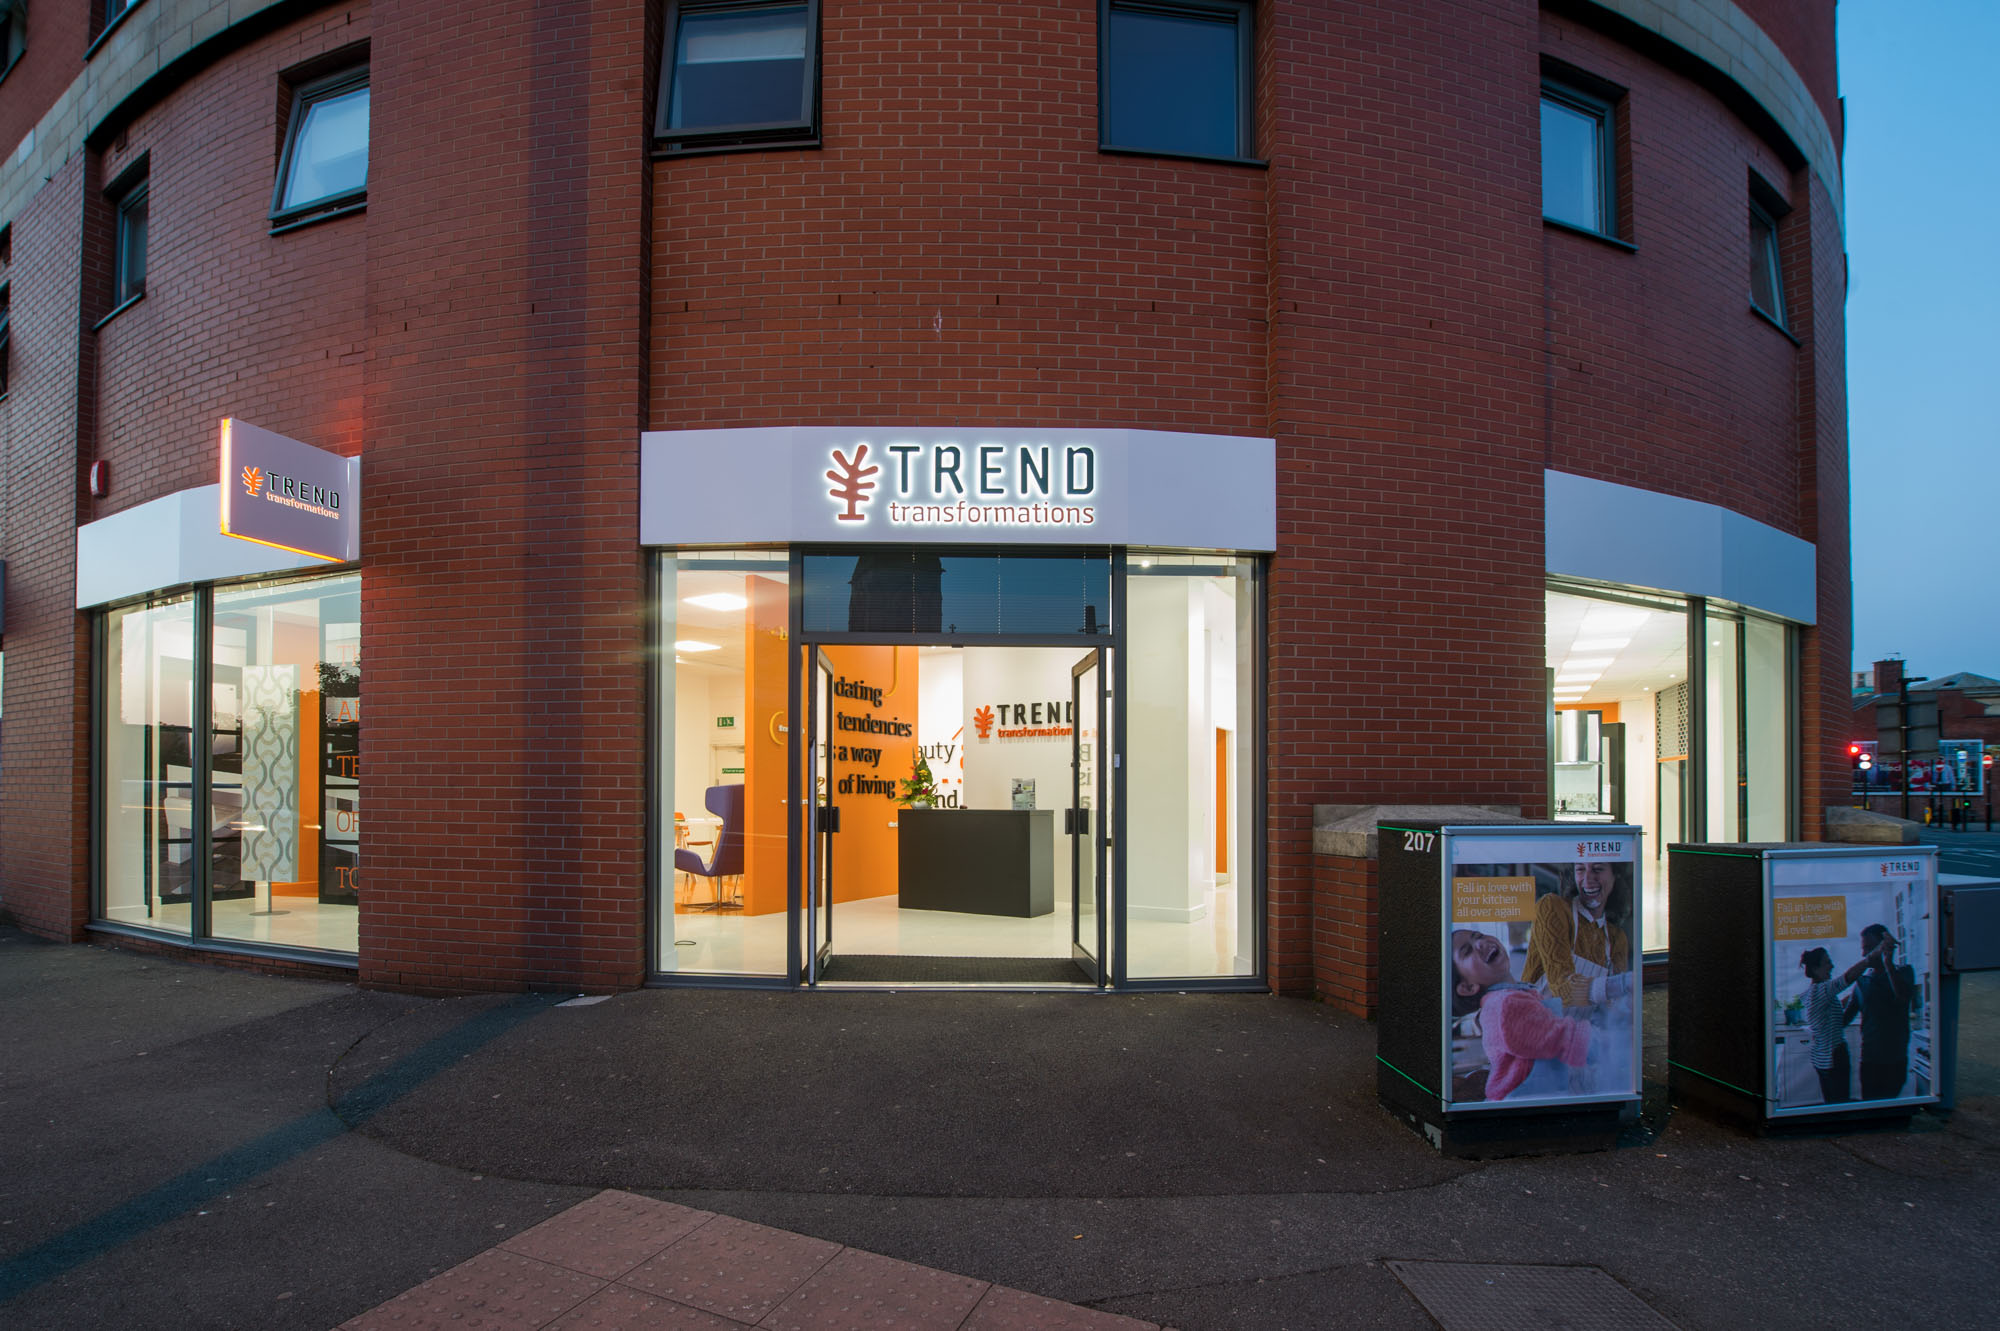 TREND Transformations Bolton - Bolton, Lancashire BL1 2AY - 01204 896730 | ShowMeLocal.com